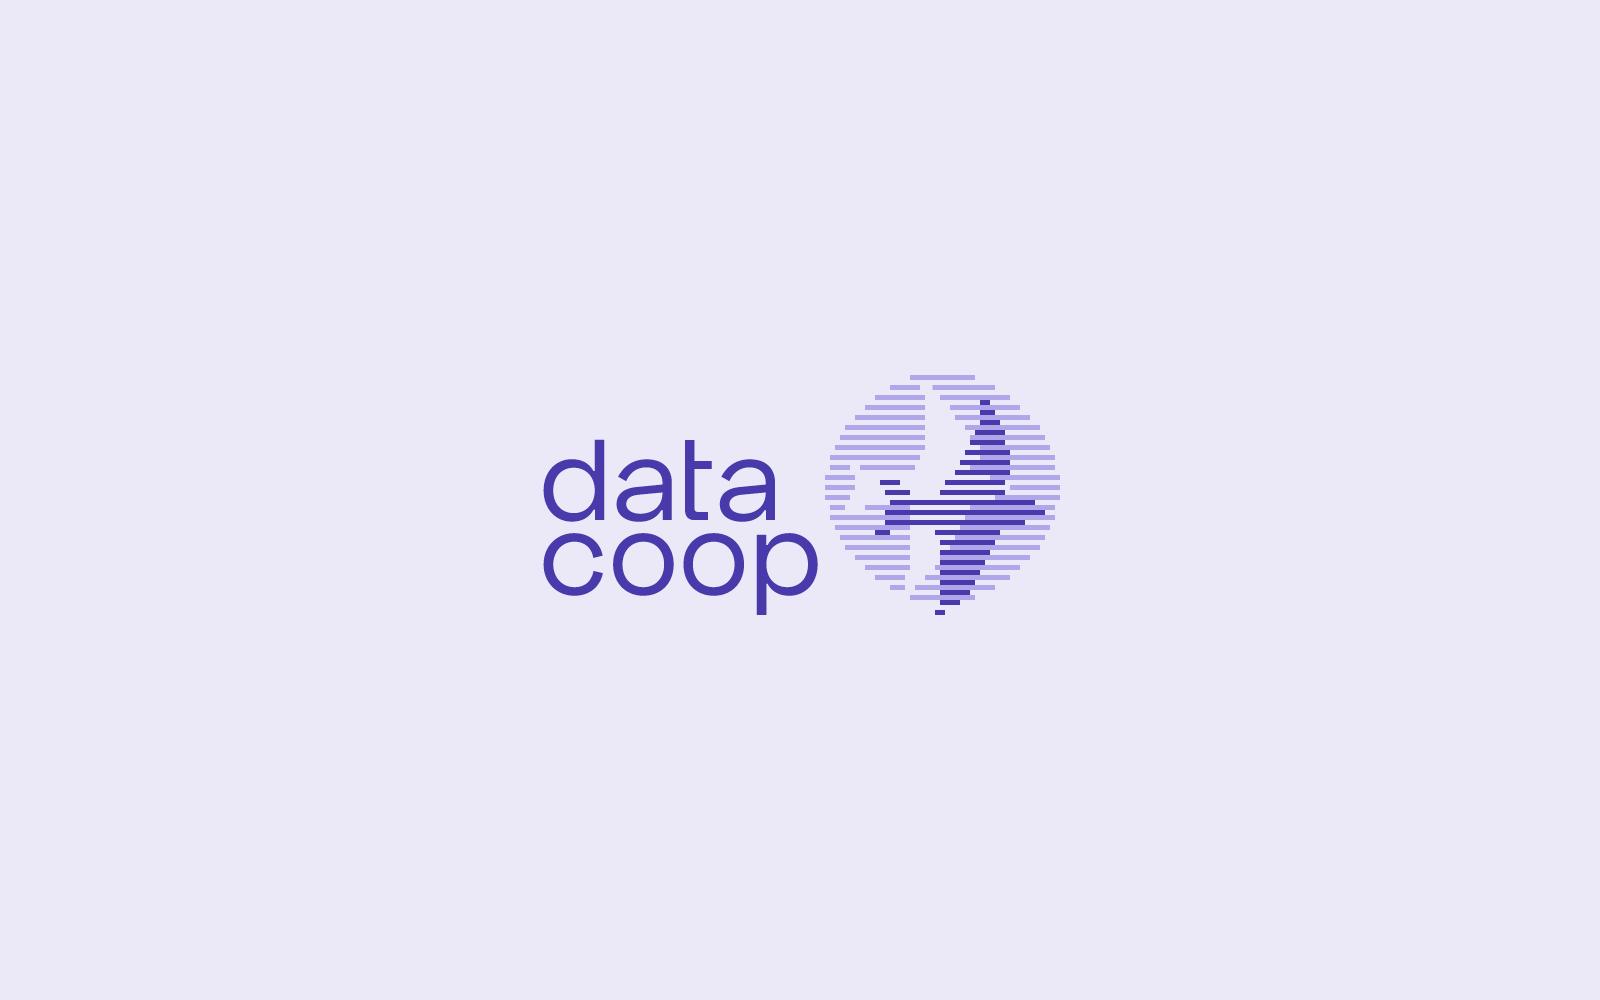 data coop logo